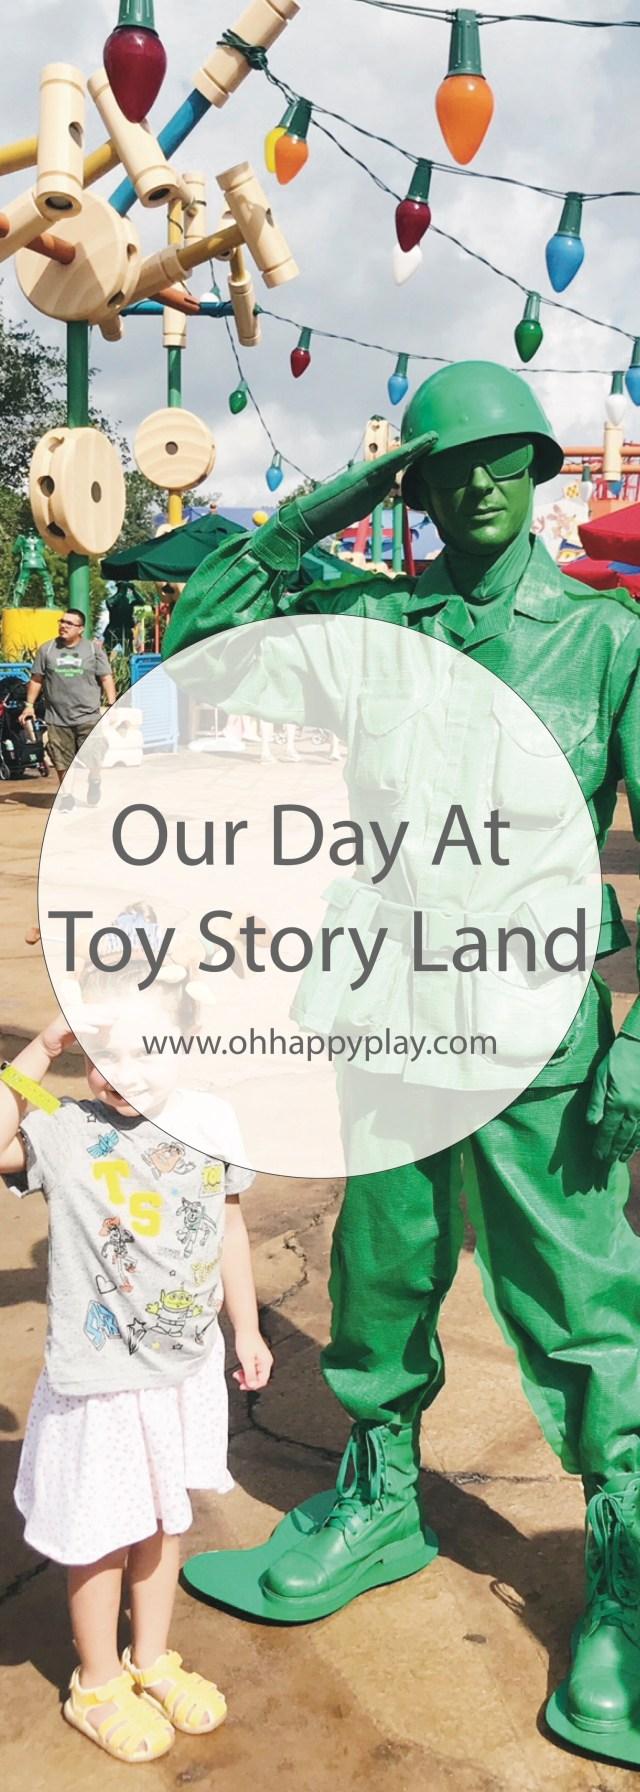 toy story land, Walt Disney world, Hollywood studios, toy story, Disney moms, Disney world